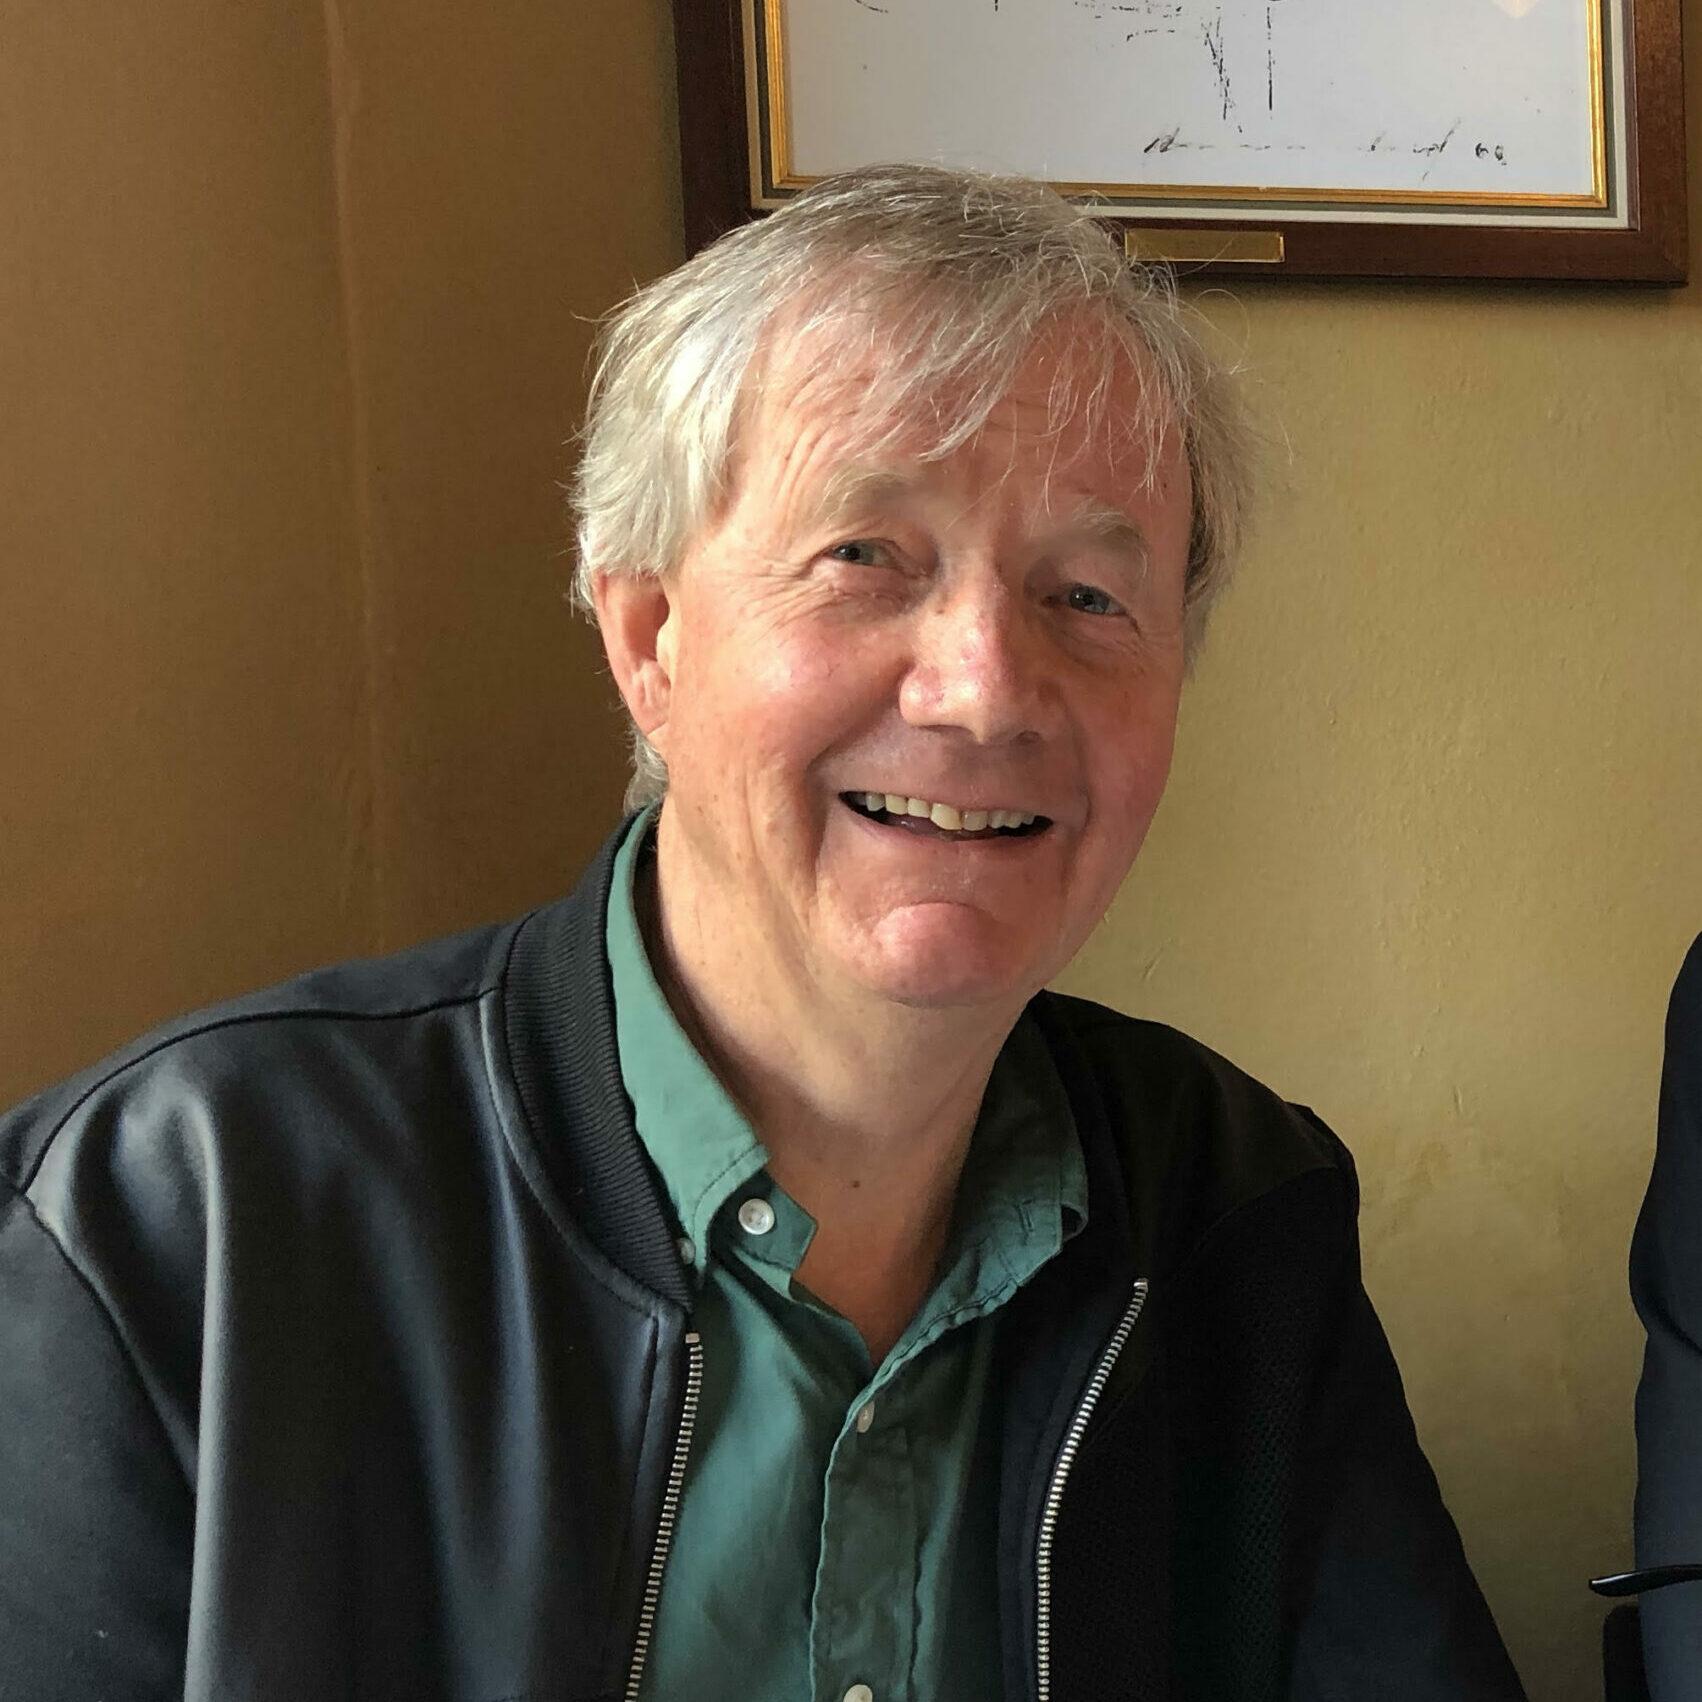 Morten Jødal